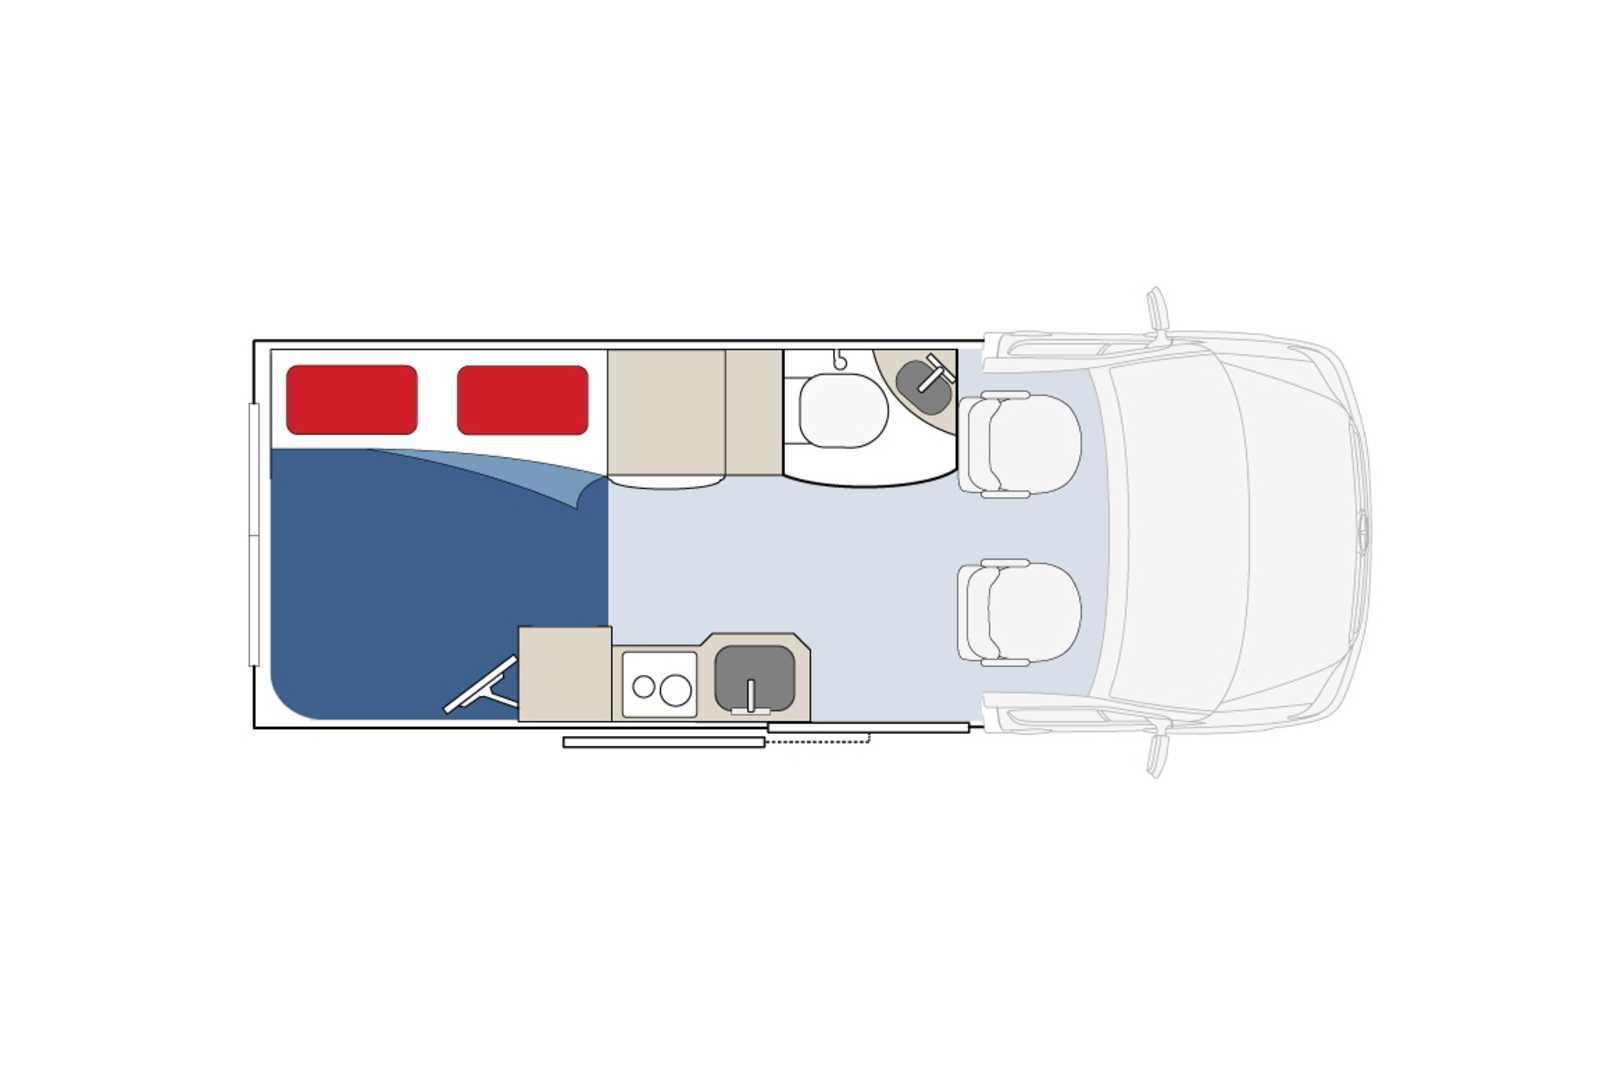 wohnmobile usa apollo rv us tourer canusa. Black Bedroom Furniture Sets. Home Design Ideas